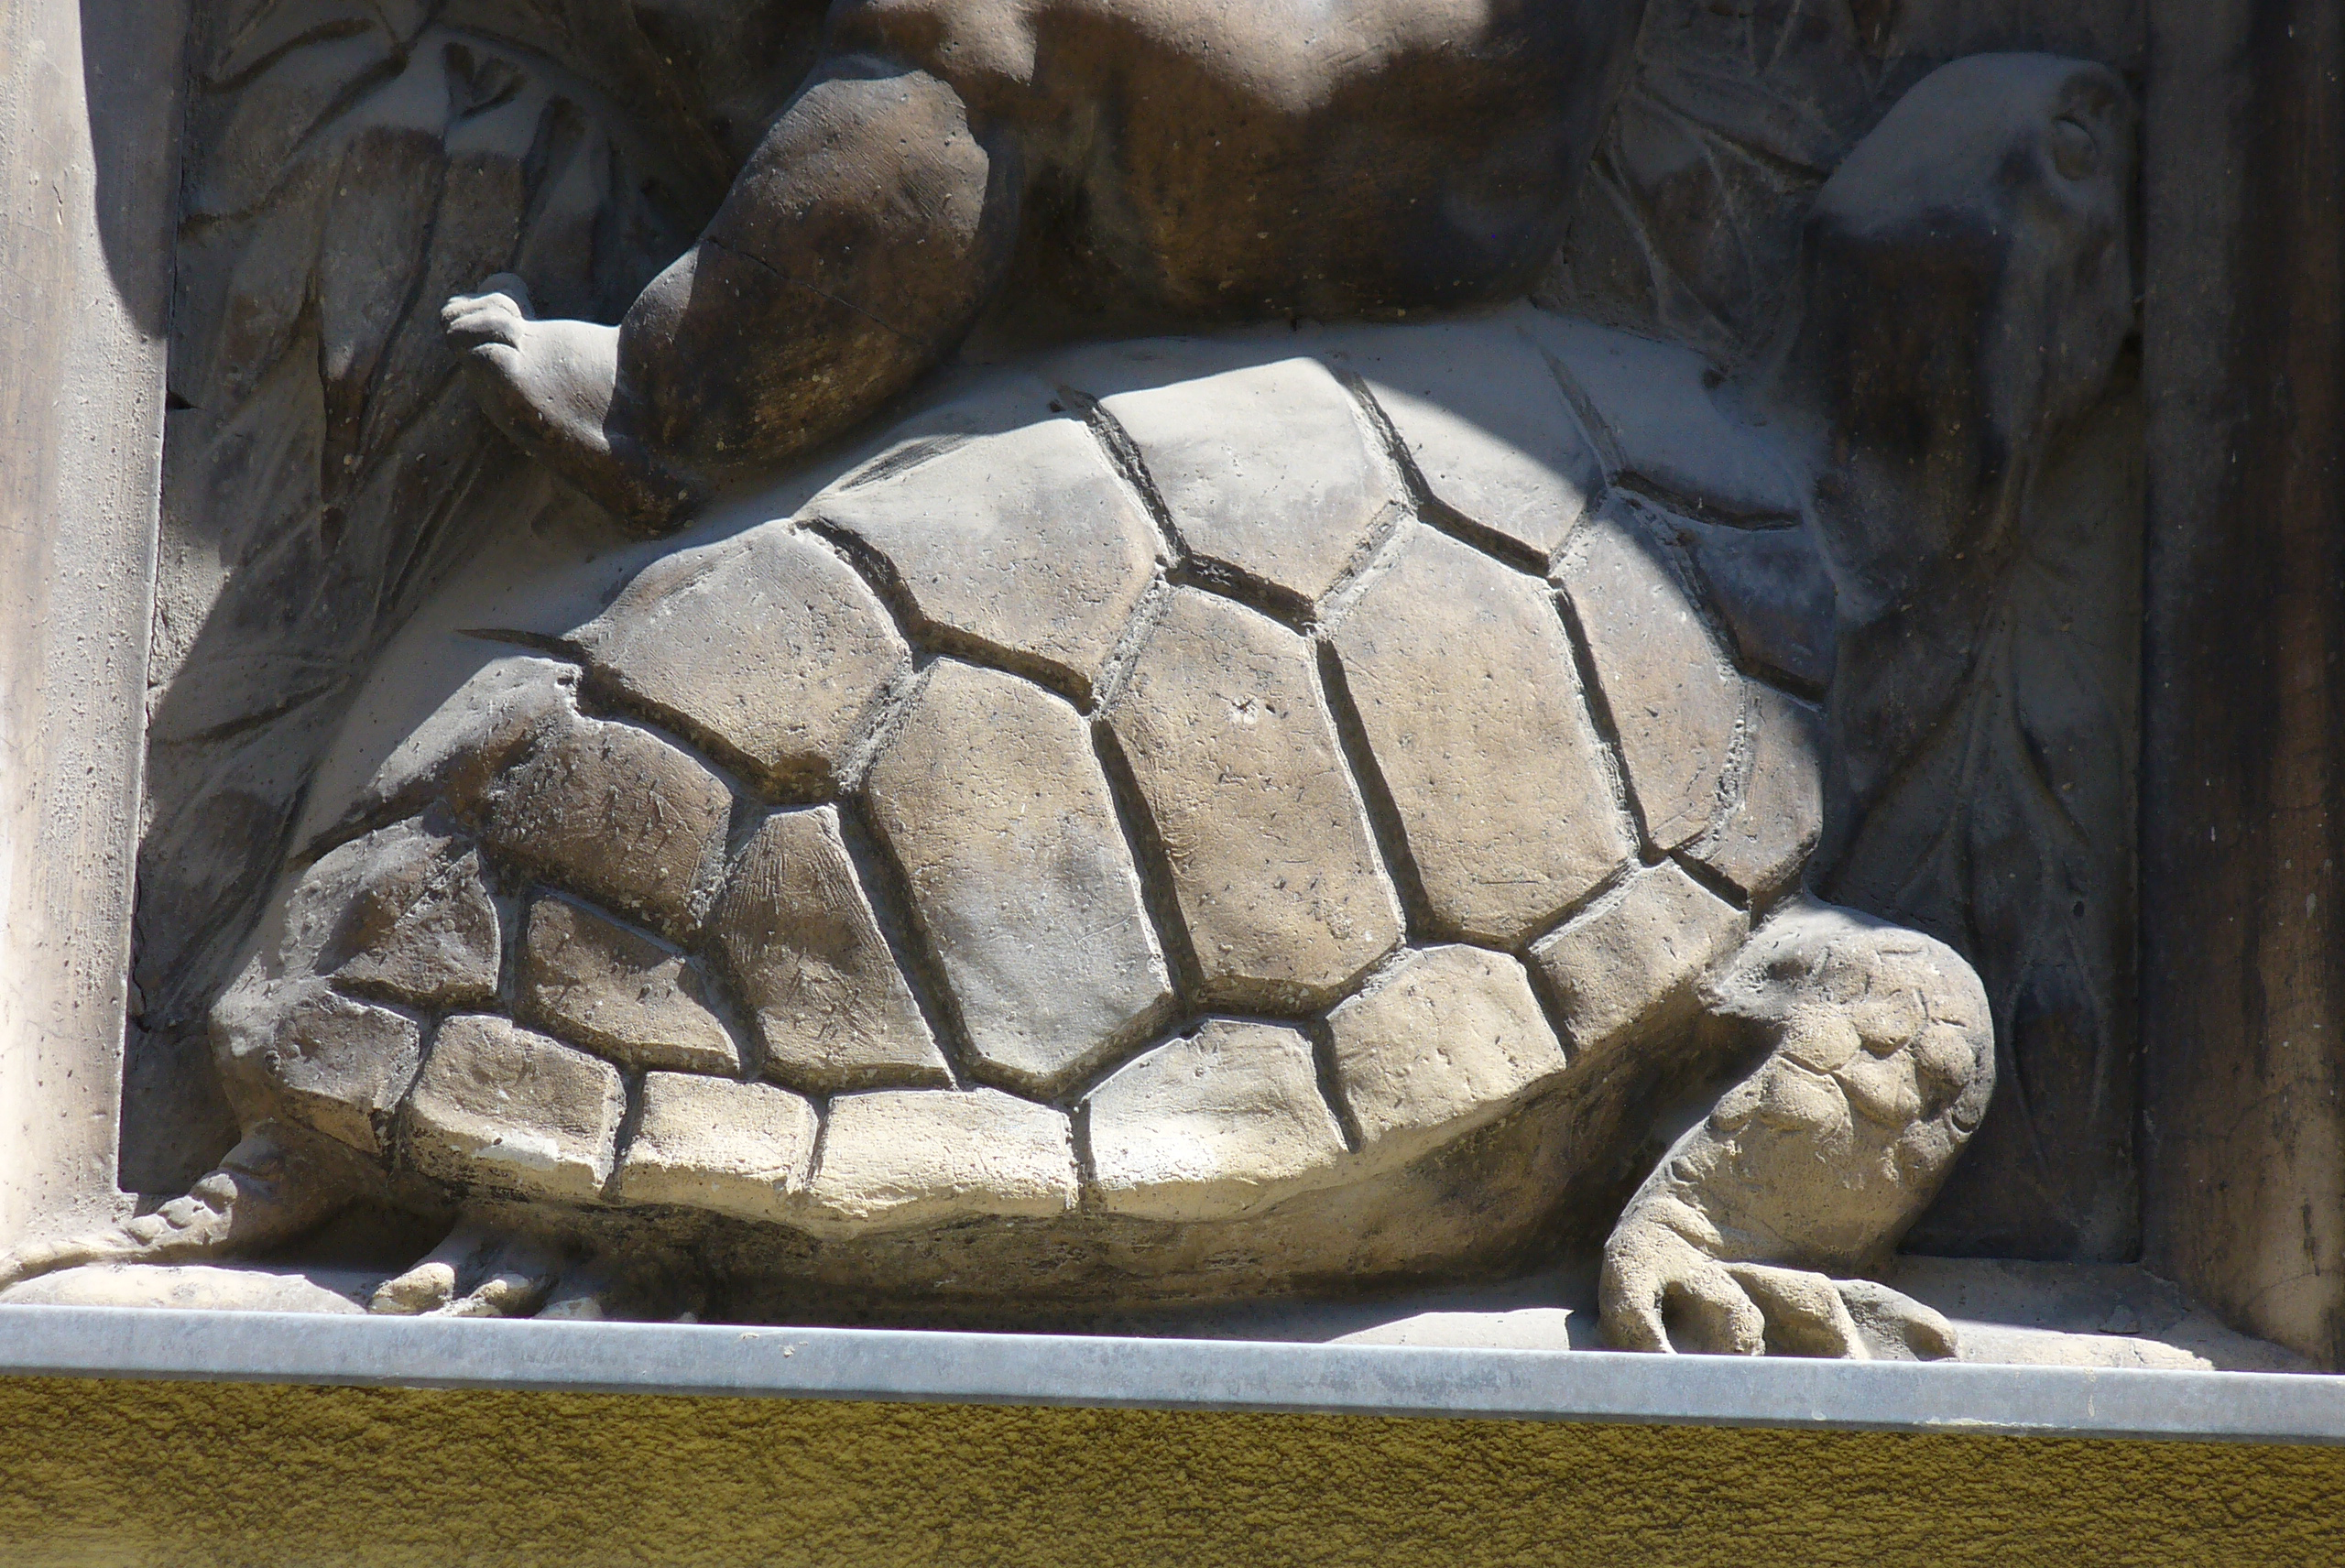 Auf Schildkrötensafari mit Elke Wallrapp (Folge 20)